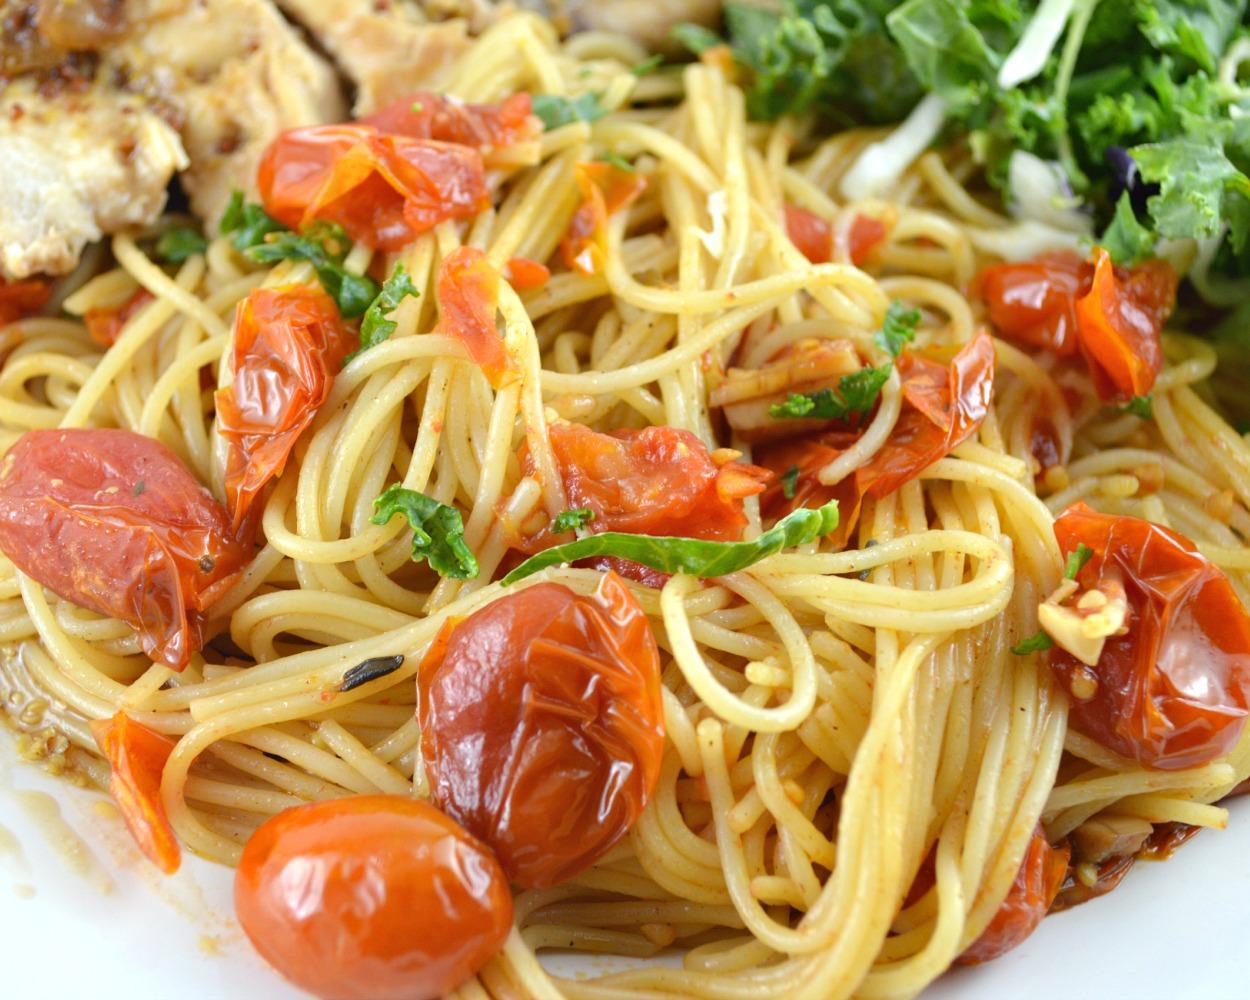 Slow-Roasted Tomato Sauce And Spaghetti